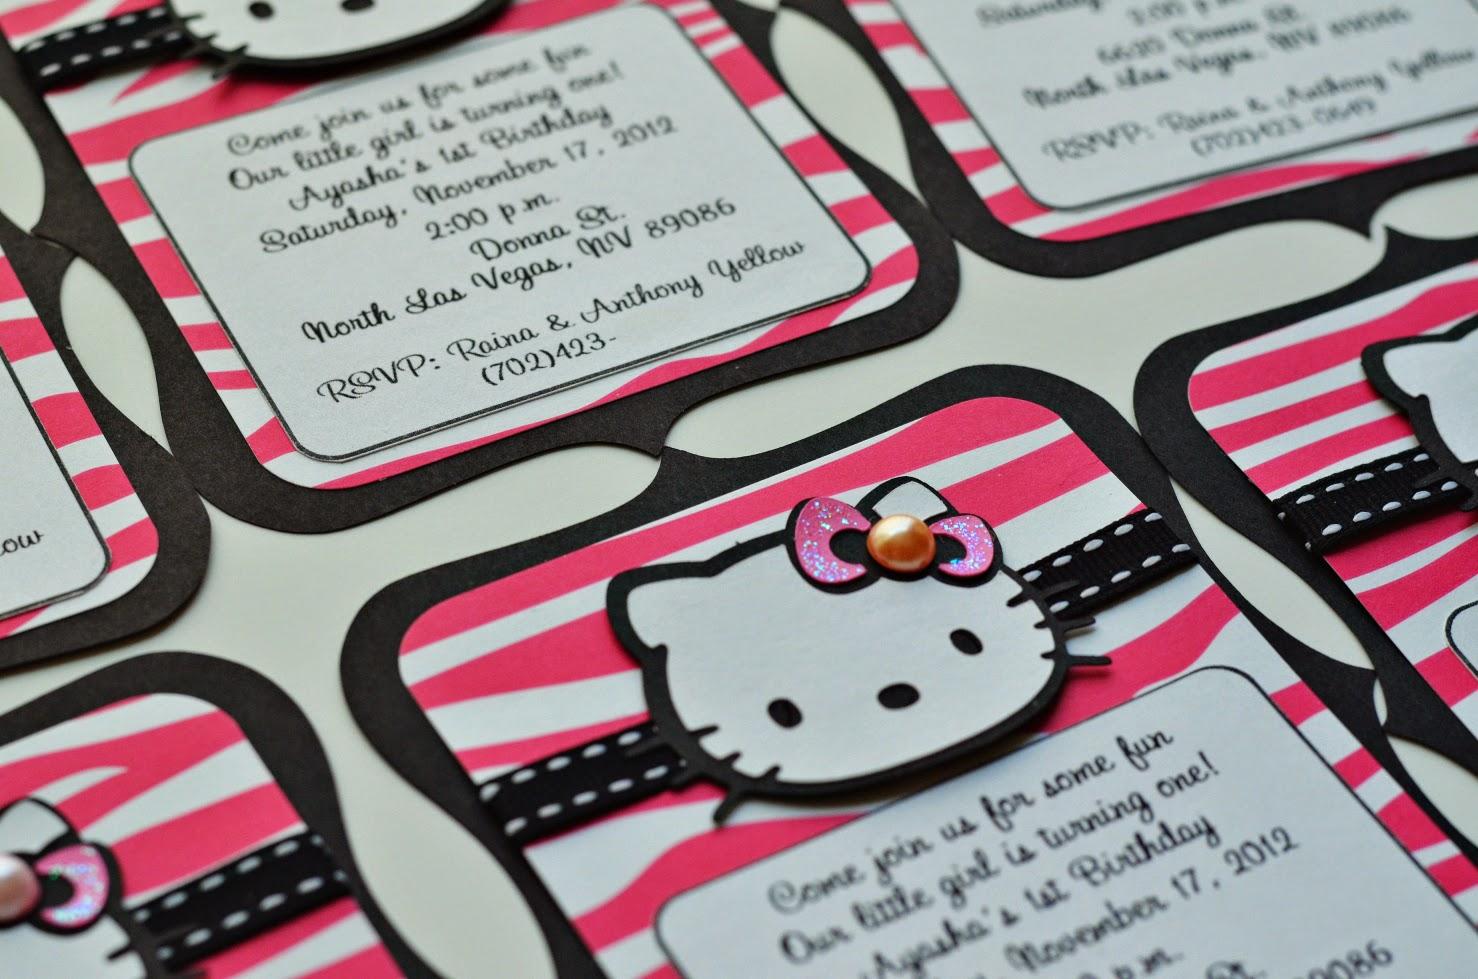 Most Inspiring Wallpaper Hello Kitty Zebra - hello+kitty+zebra+hot+pink+invitations+and+banner+(2)  Best Photo Reference_29513.JPG